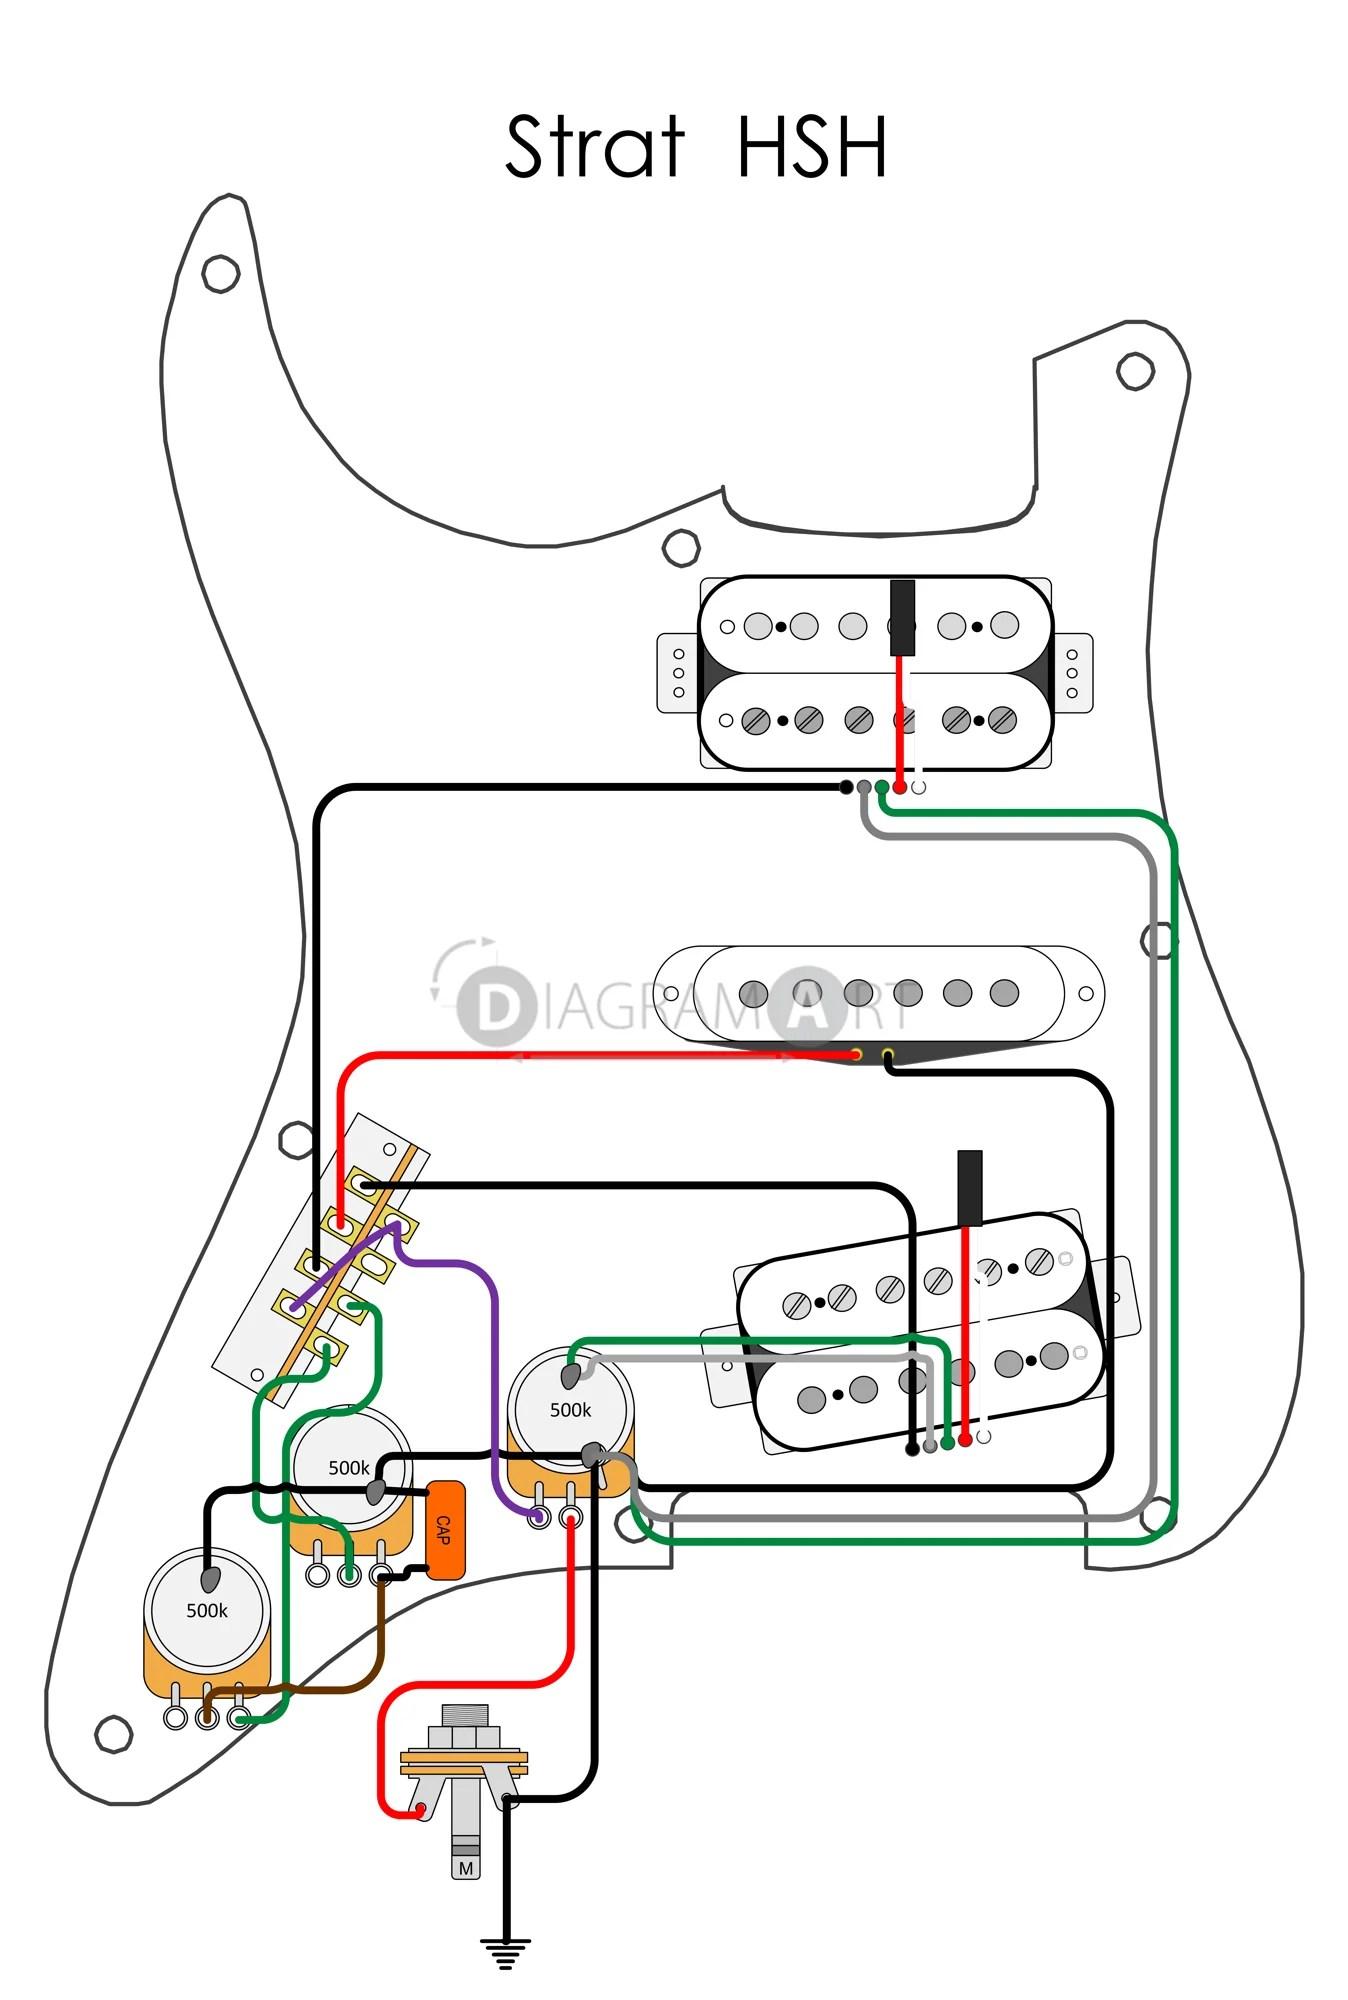 hight resolution of free download guitar wiring diagrams diagram jem simple wiring schema car air horn wiring diagram guitar wiring diagram hsh